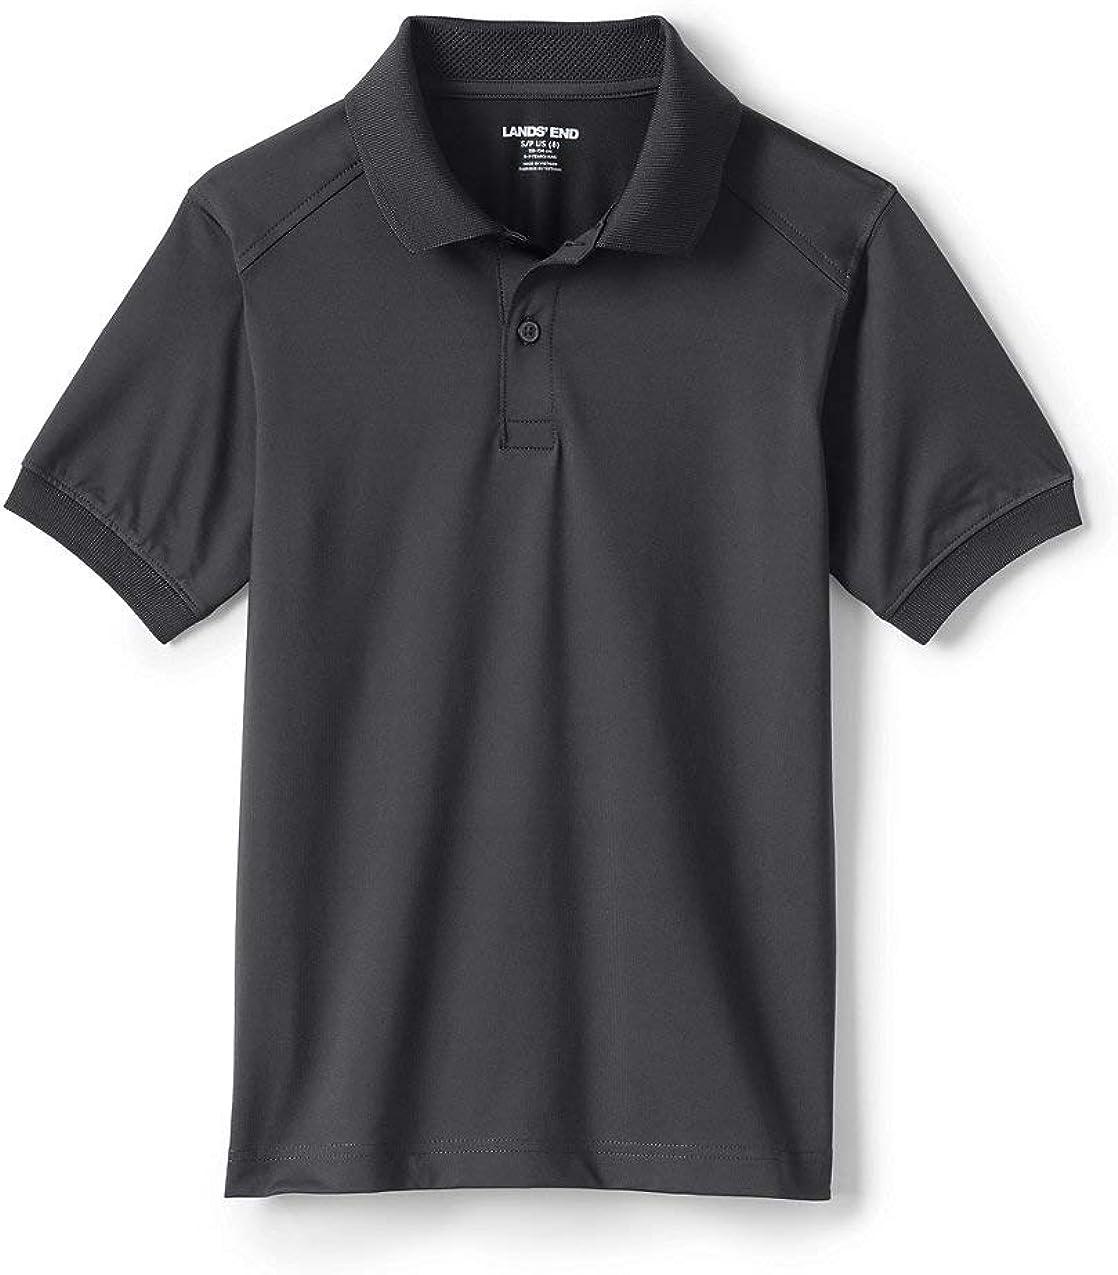 Lands' End School Uniform Little Kids Short Sleeve Rapid Dry Polo Shirt